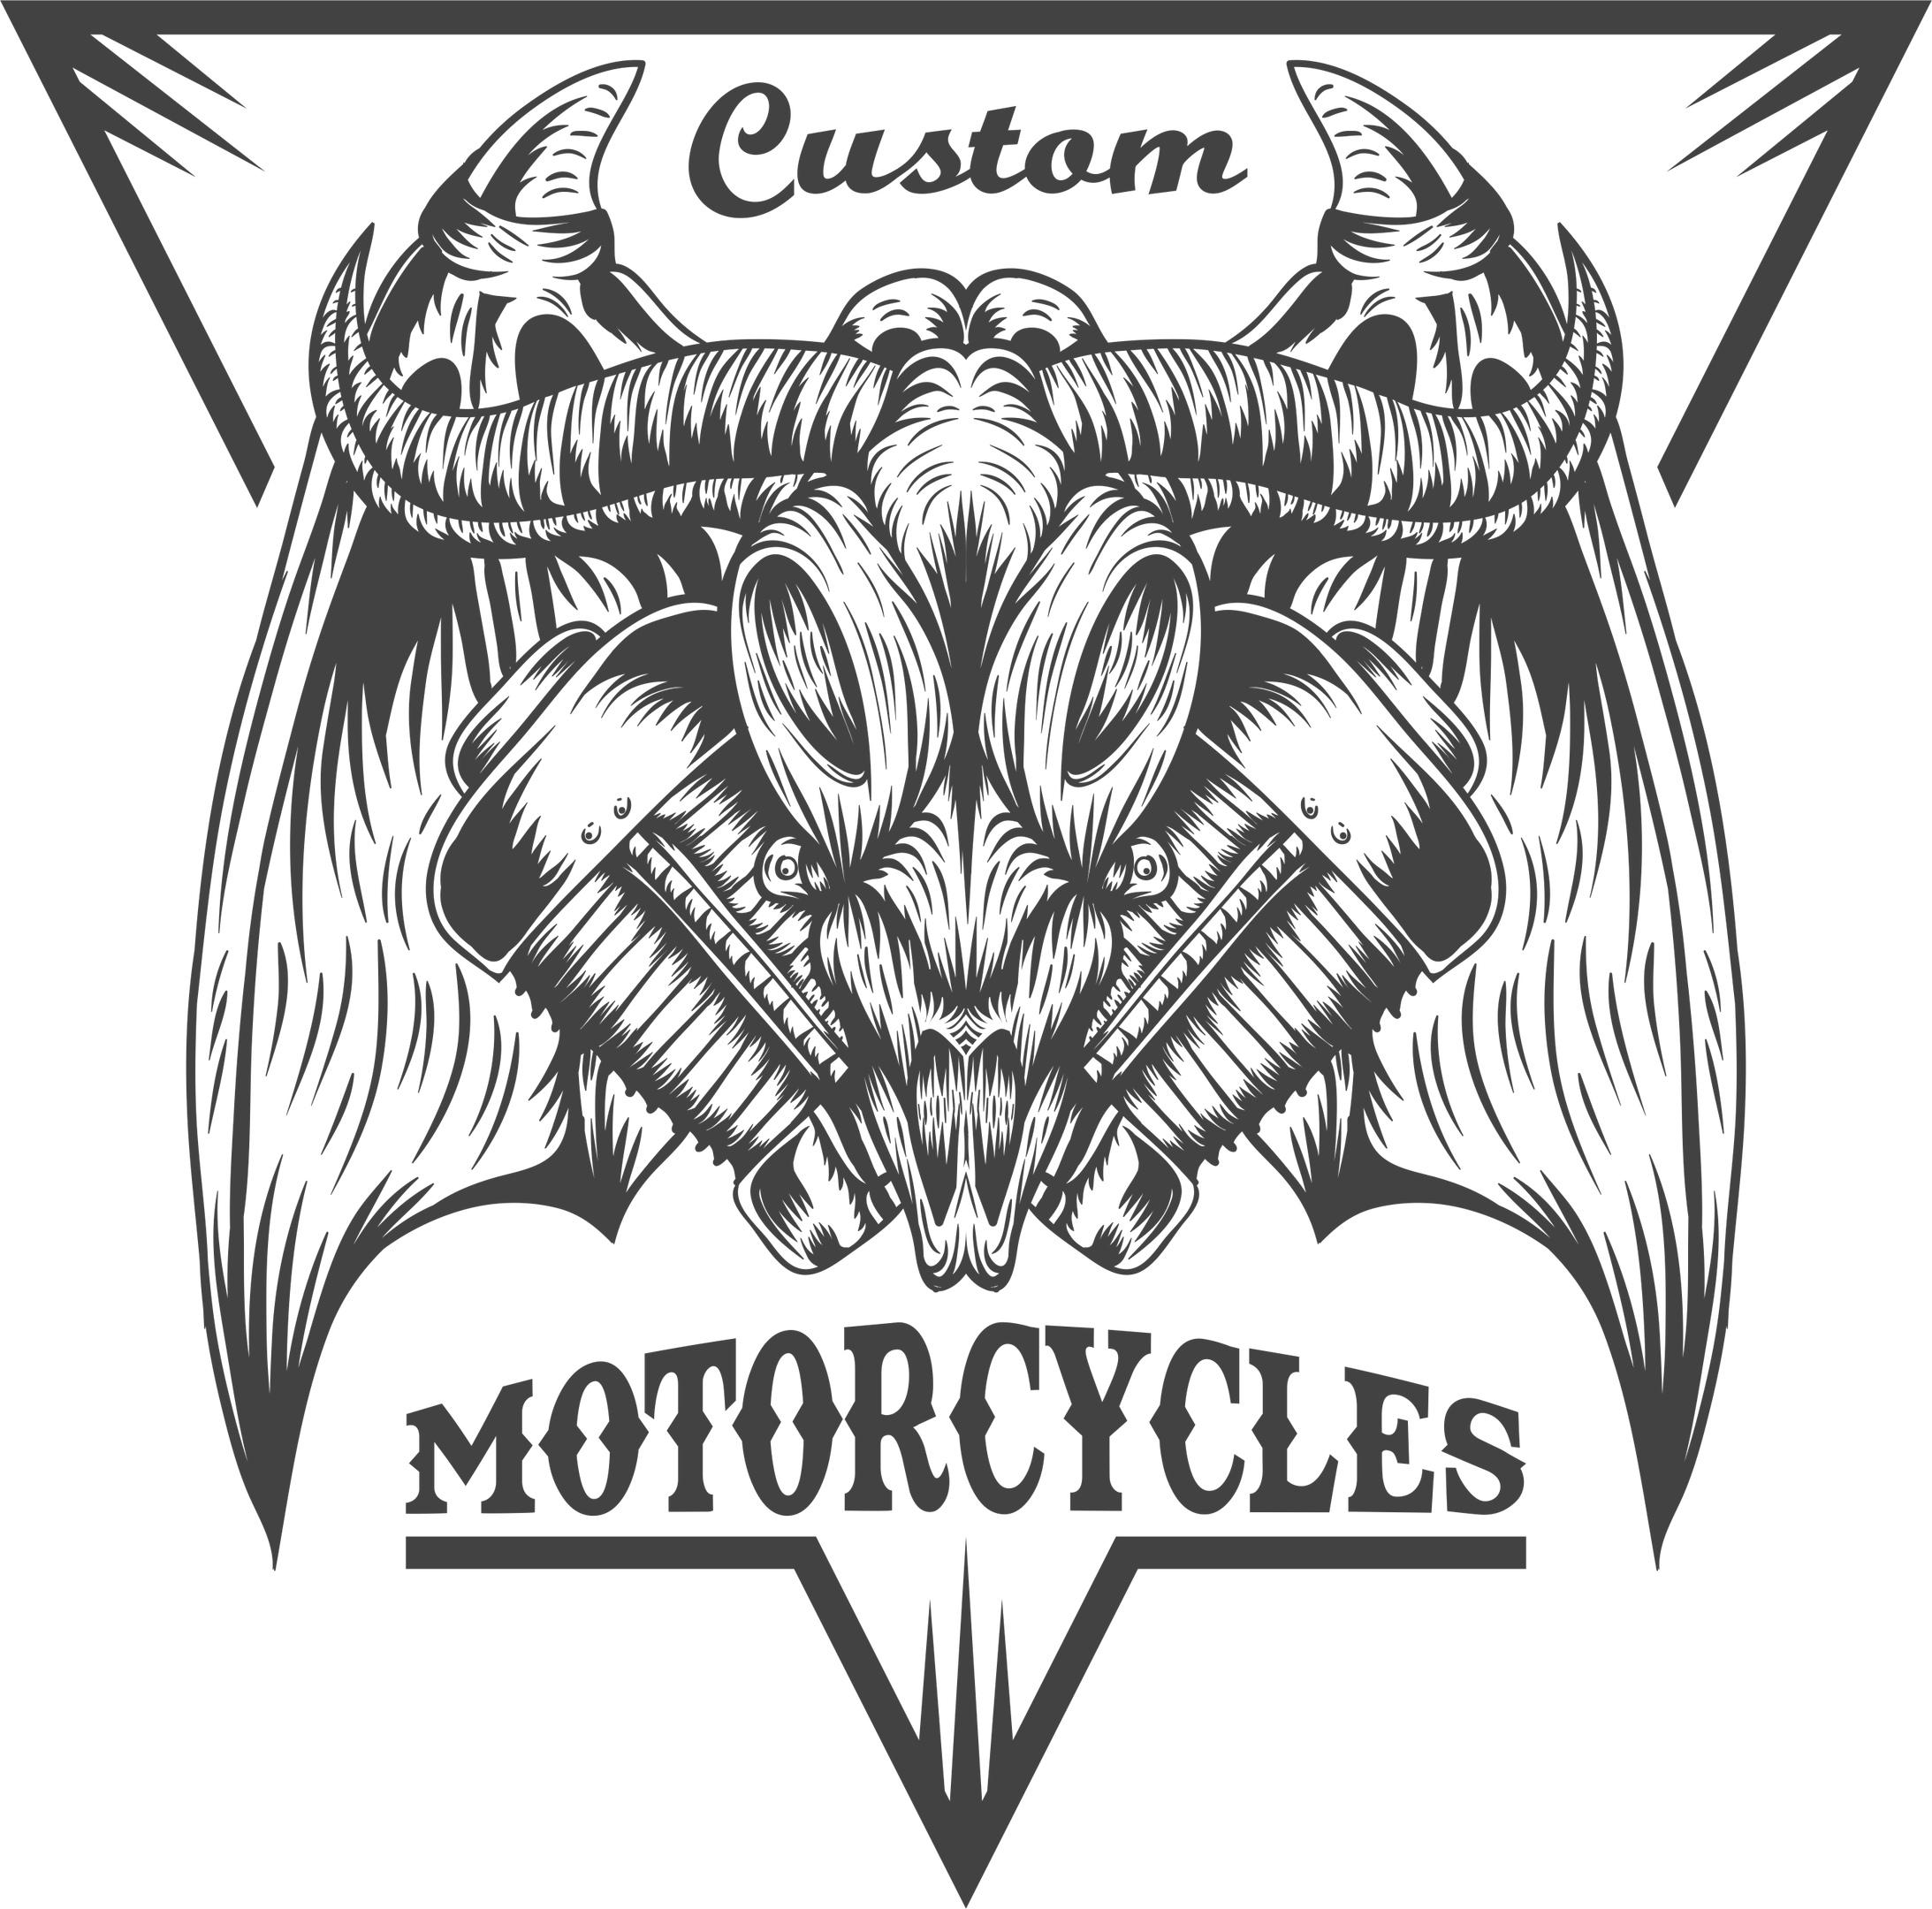 Bull Moto Sticker Free Vector